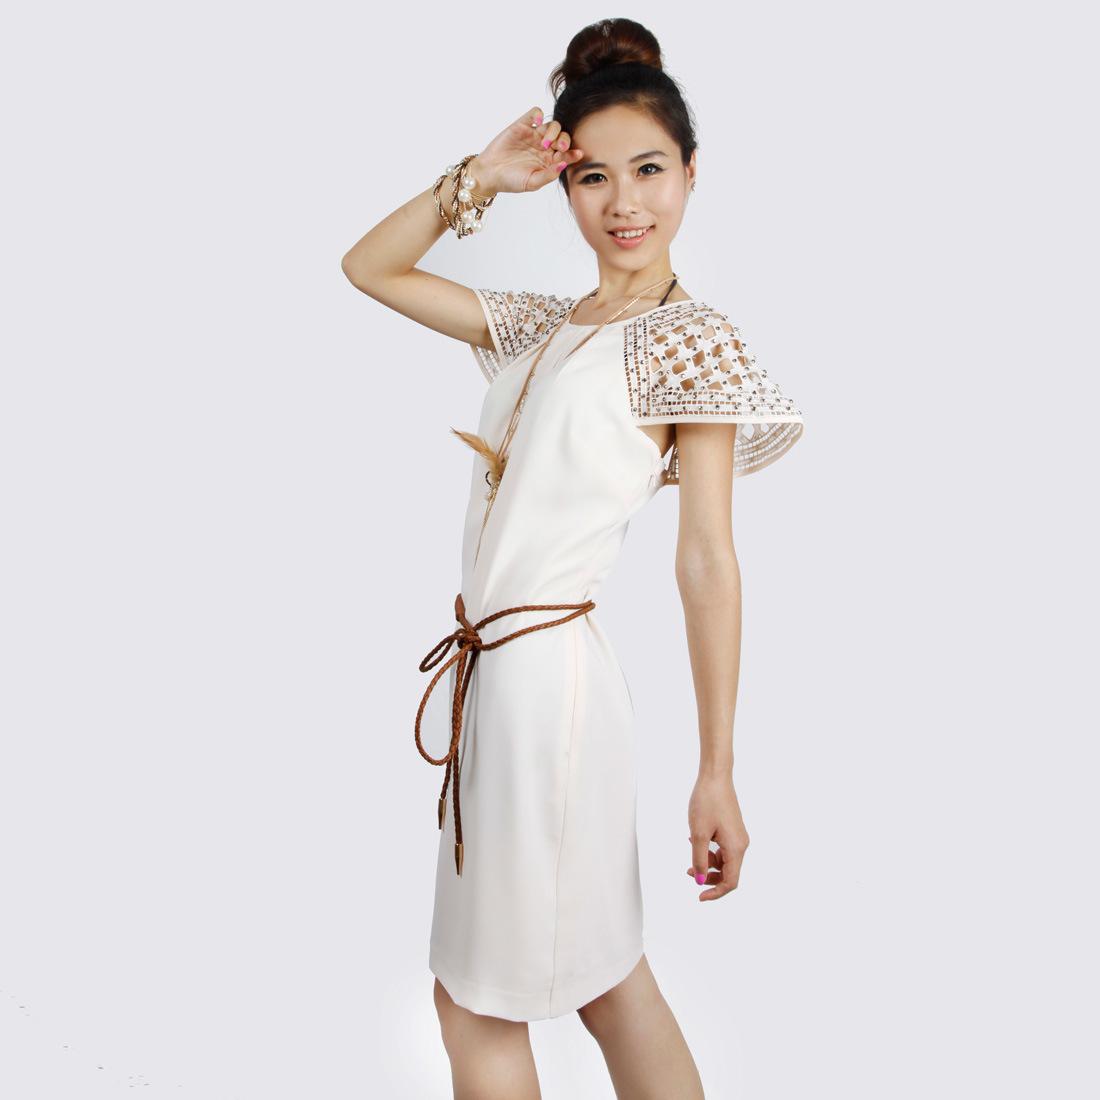 Ladies dress sm41489